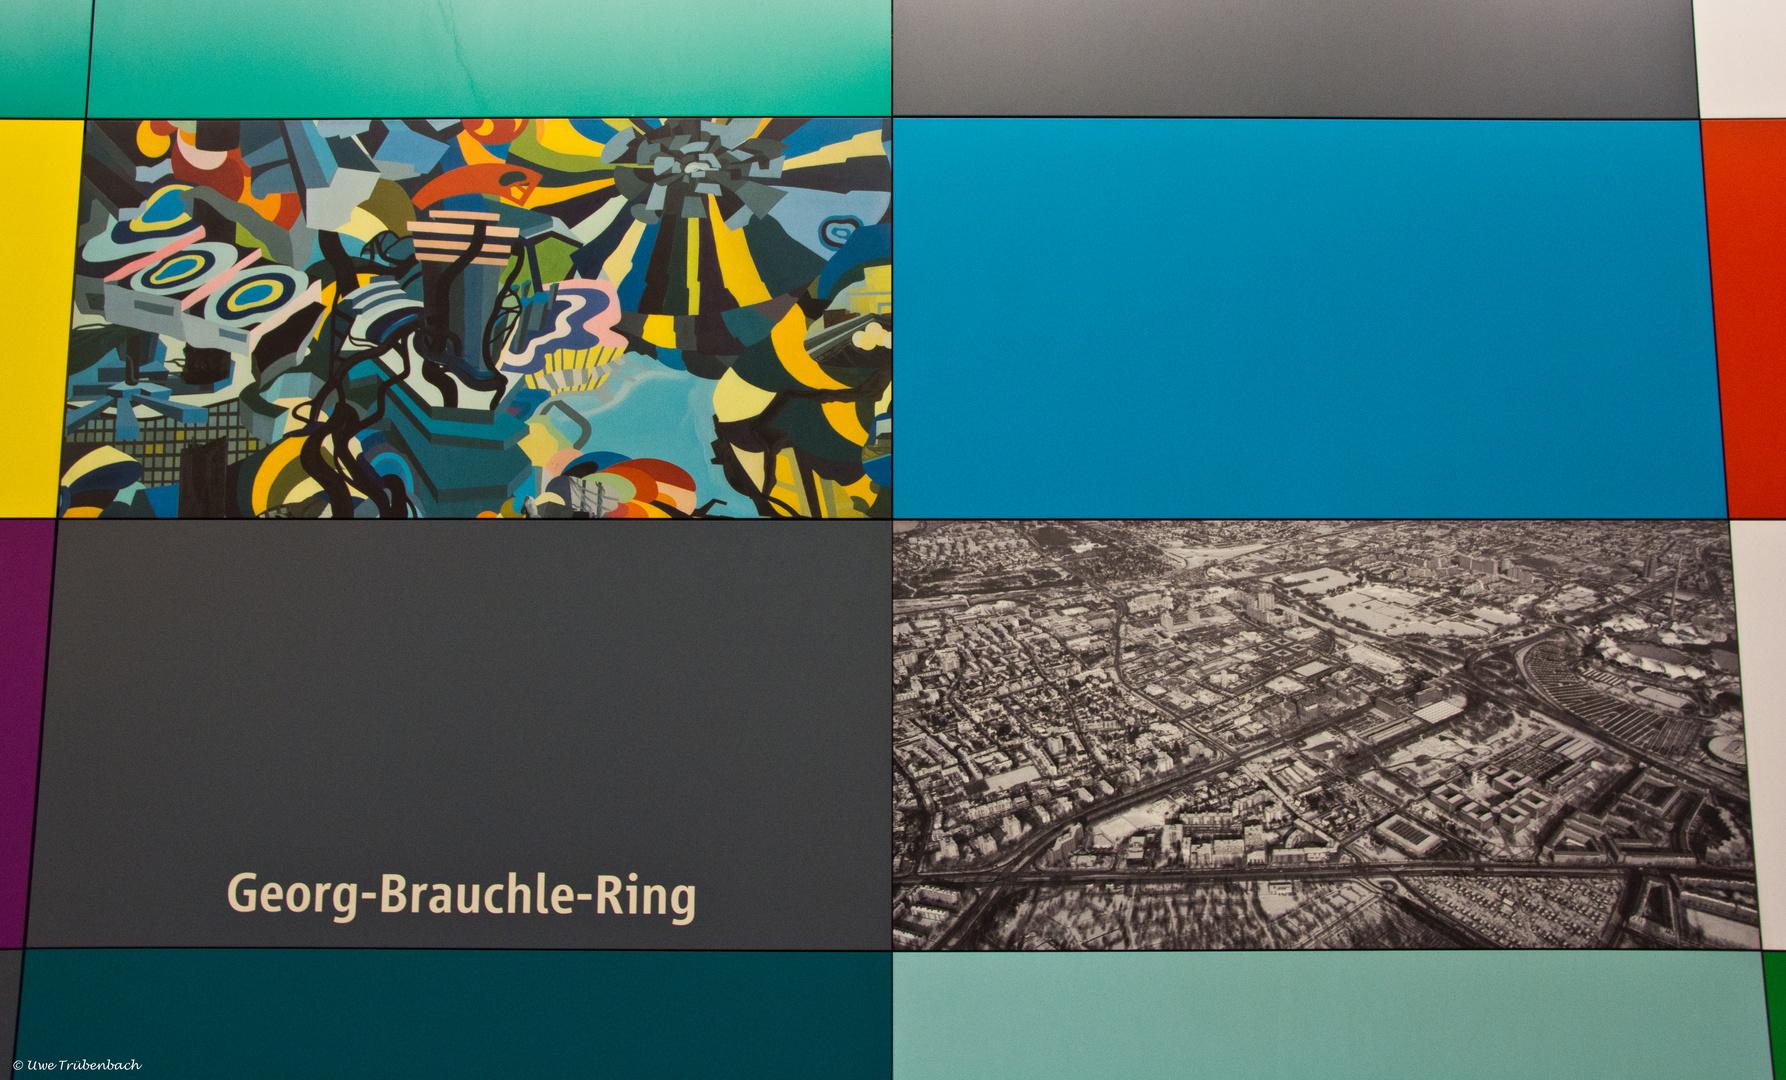 U-Bahnhof Georg-Brauchle-Ring (3)